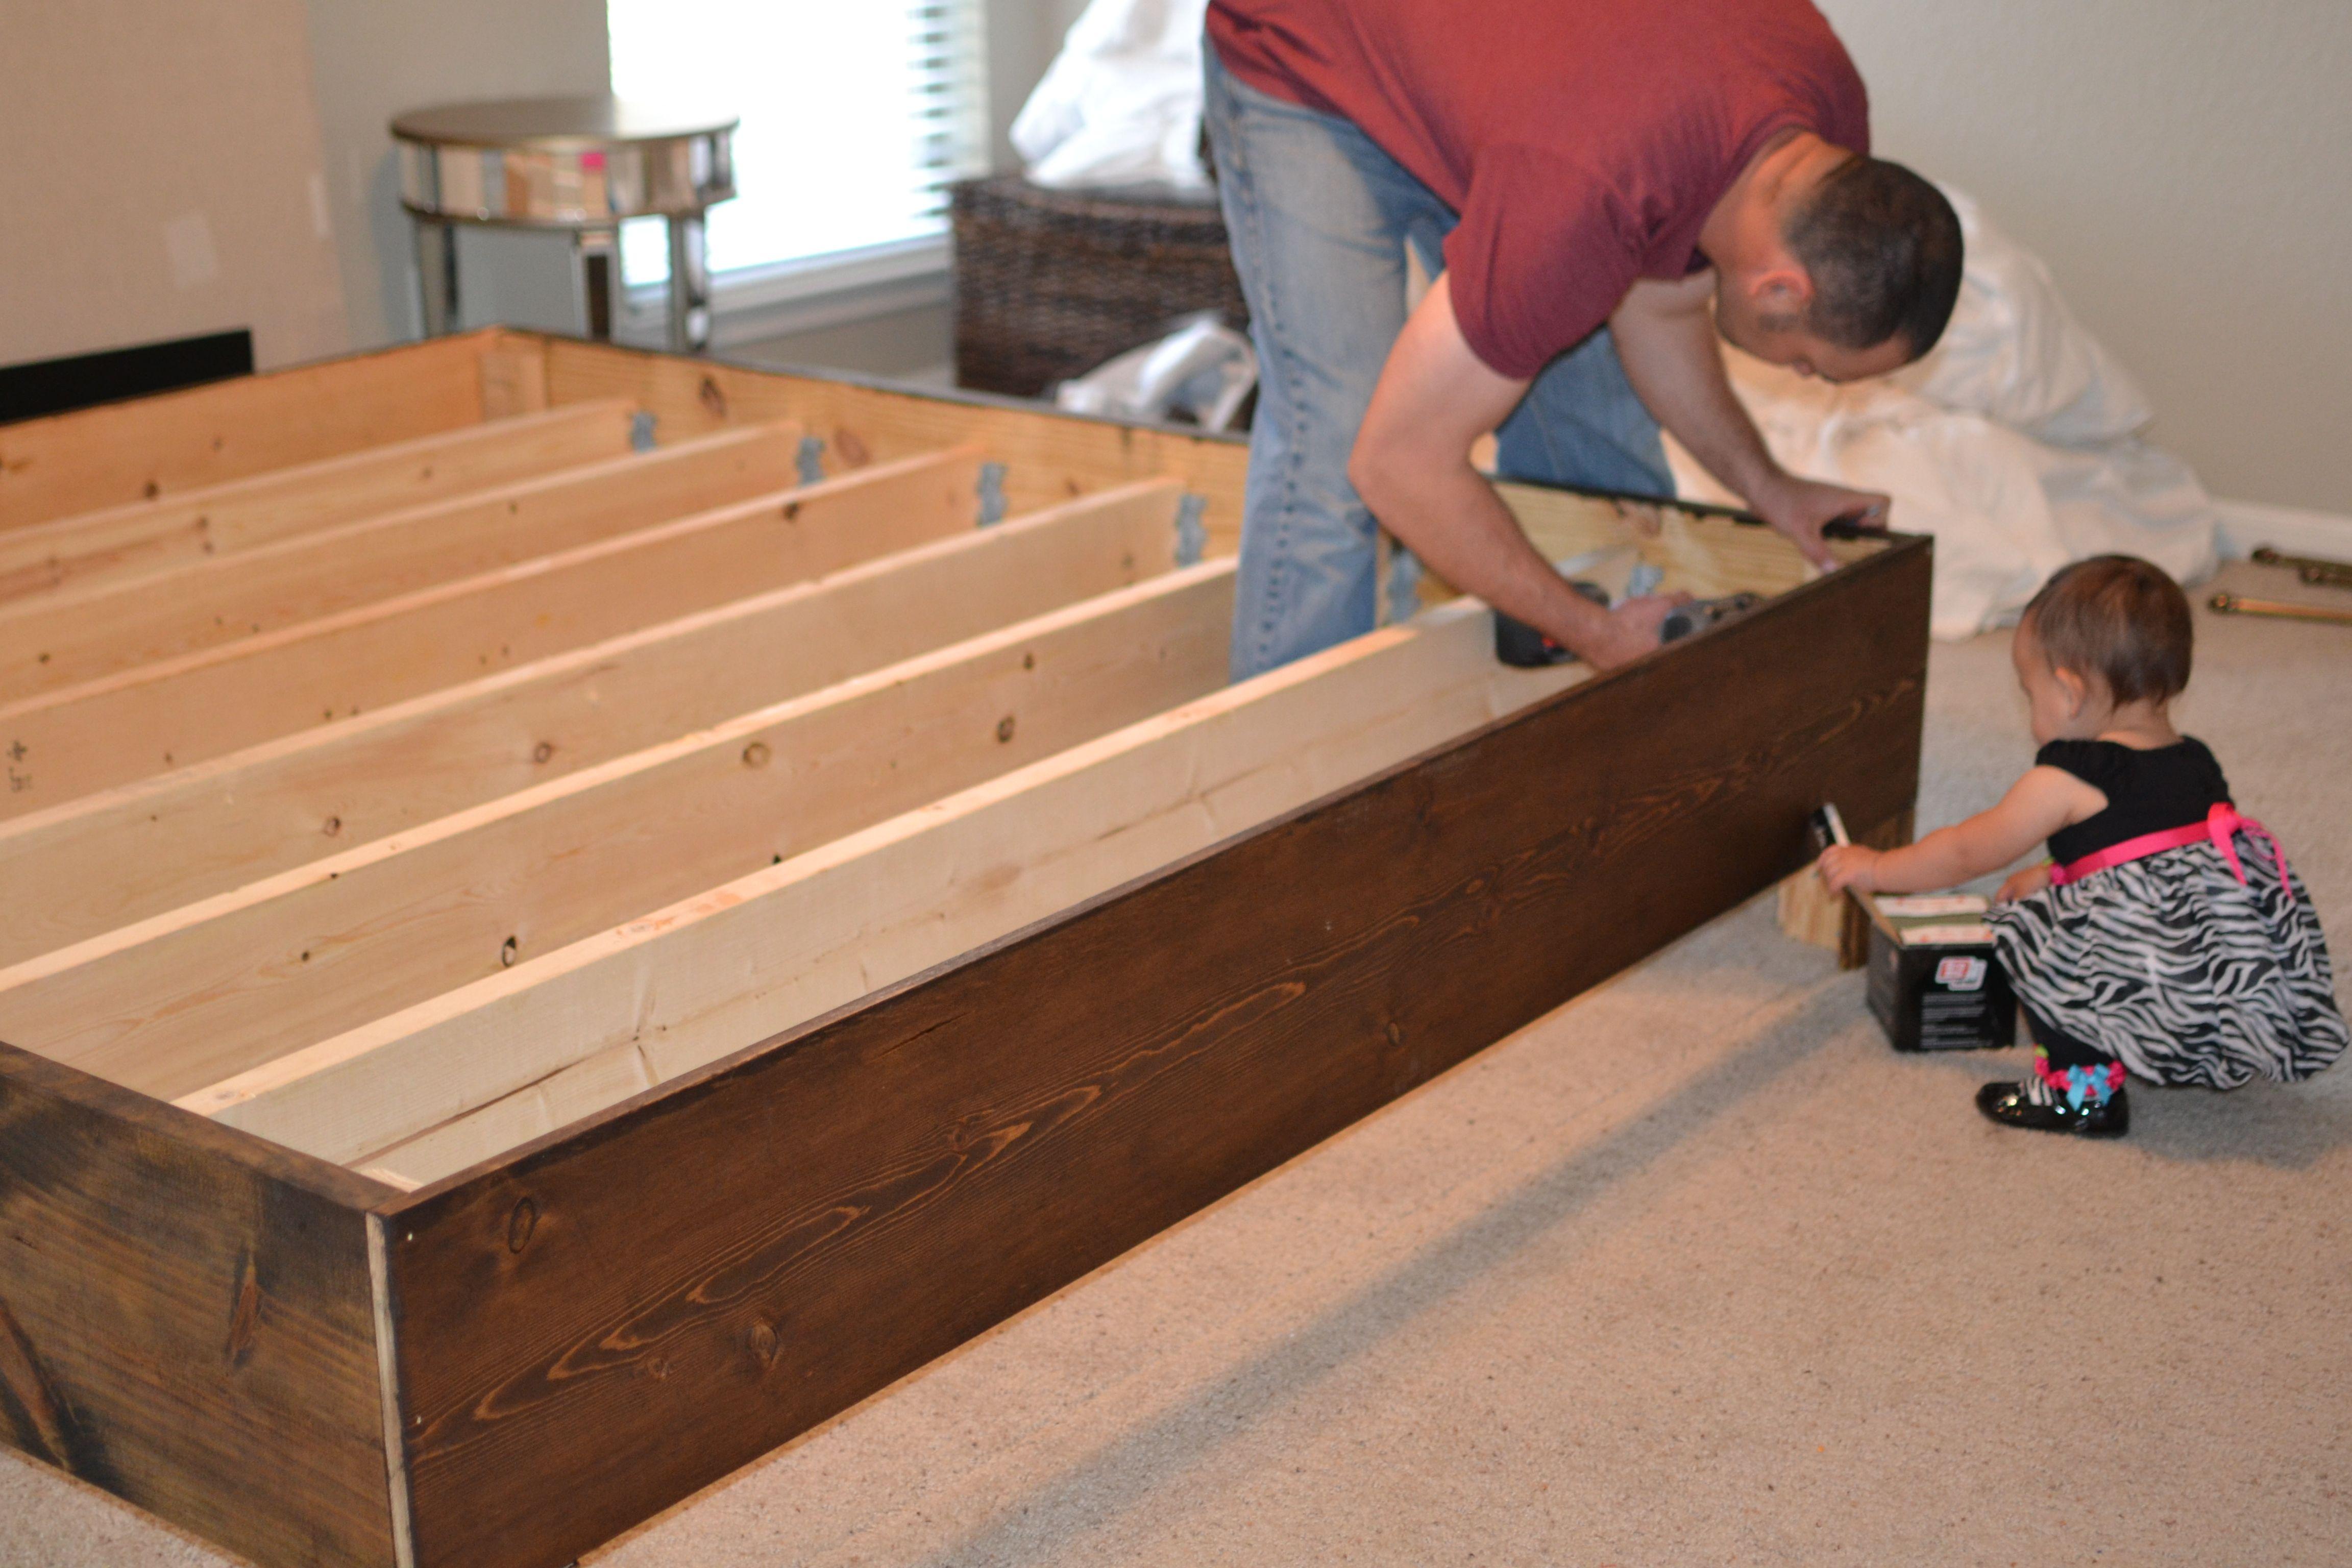 diy rustic bed frame iNGF3Kkm Rustic bed frame, Home diy